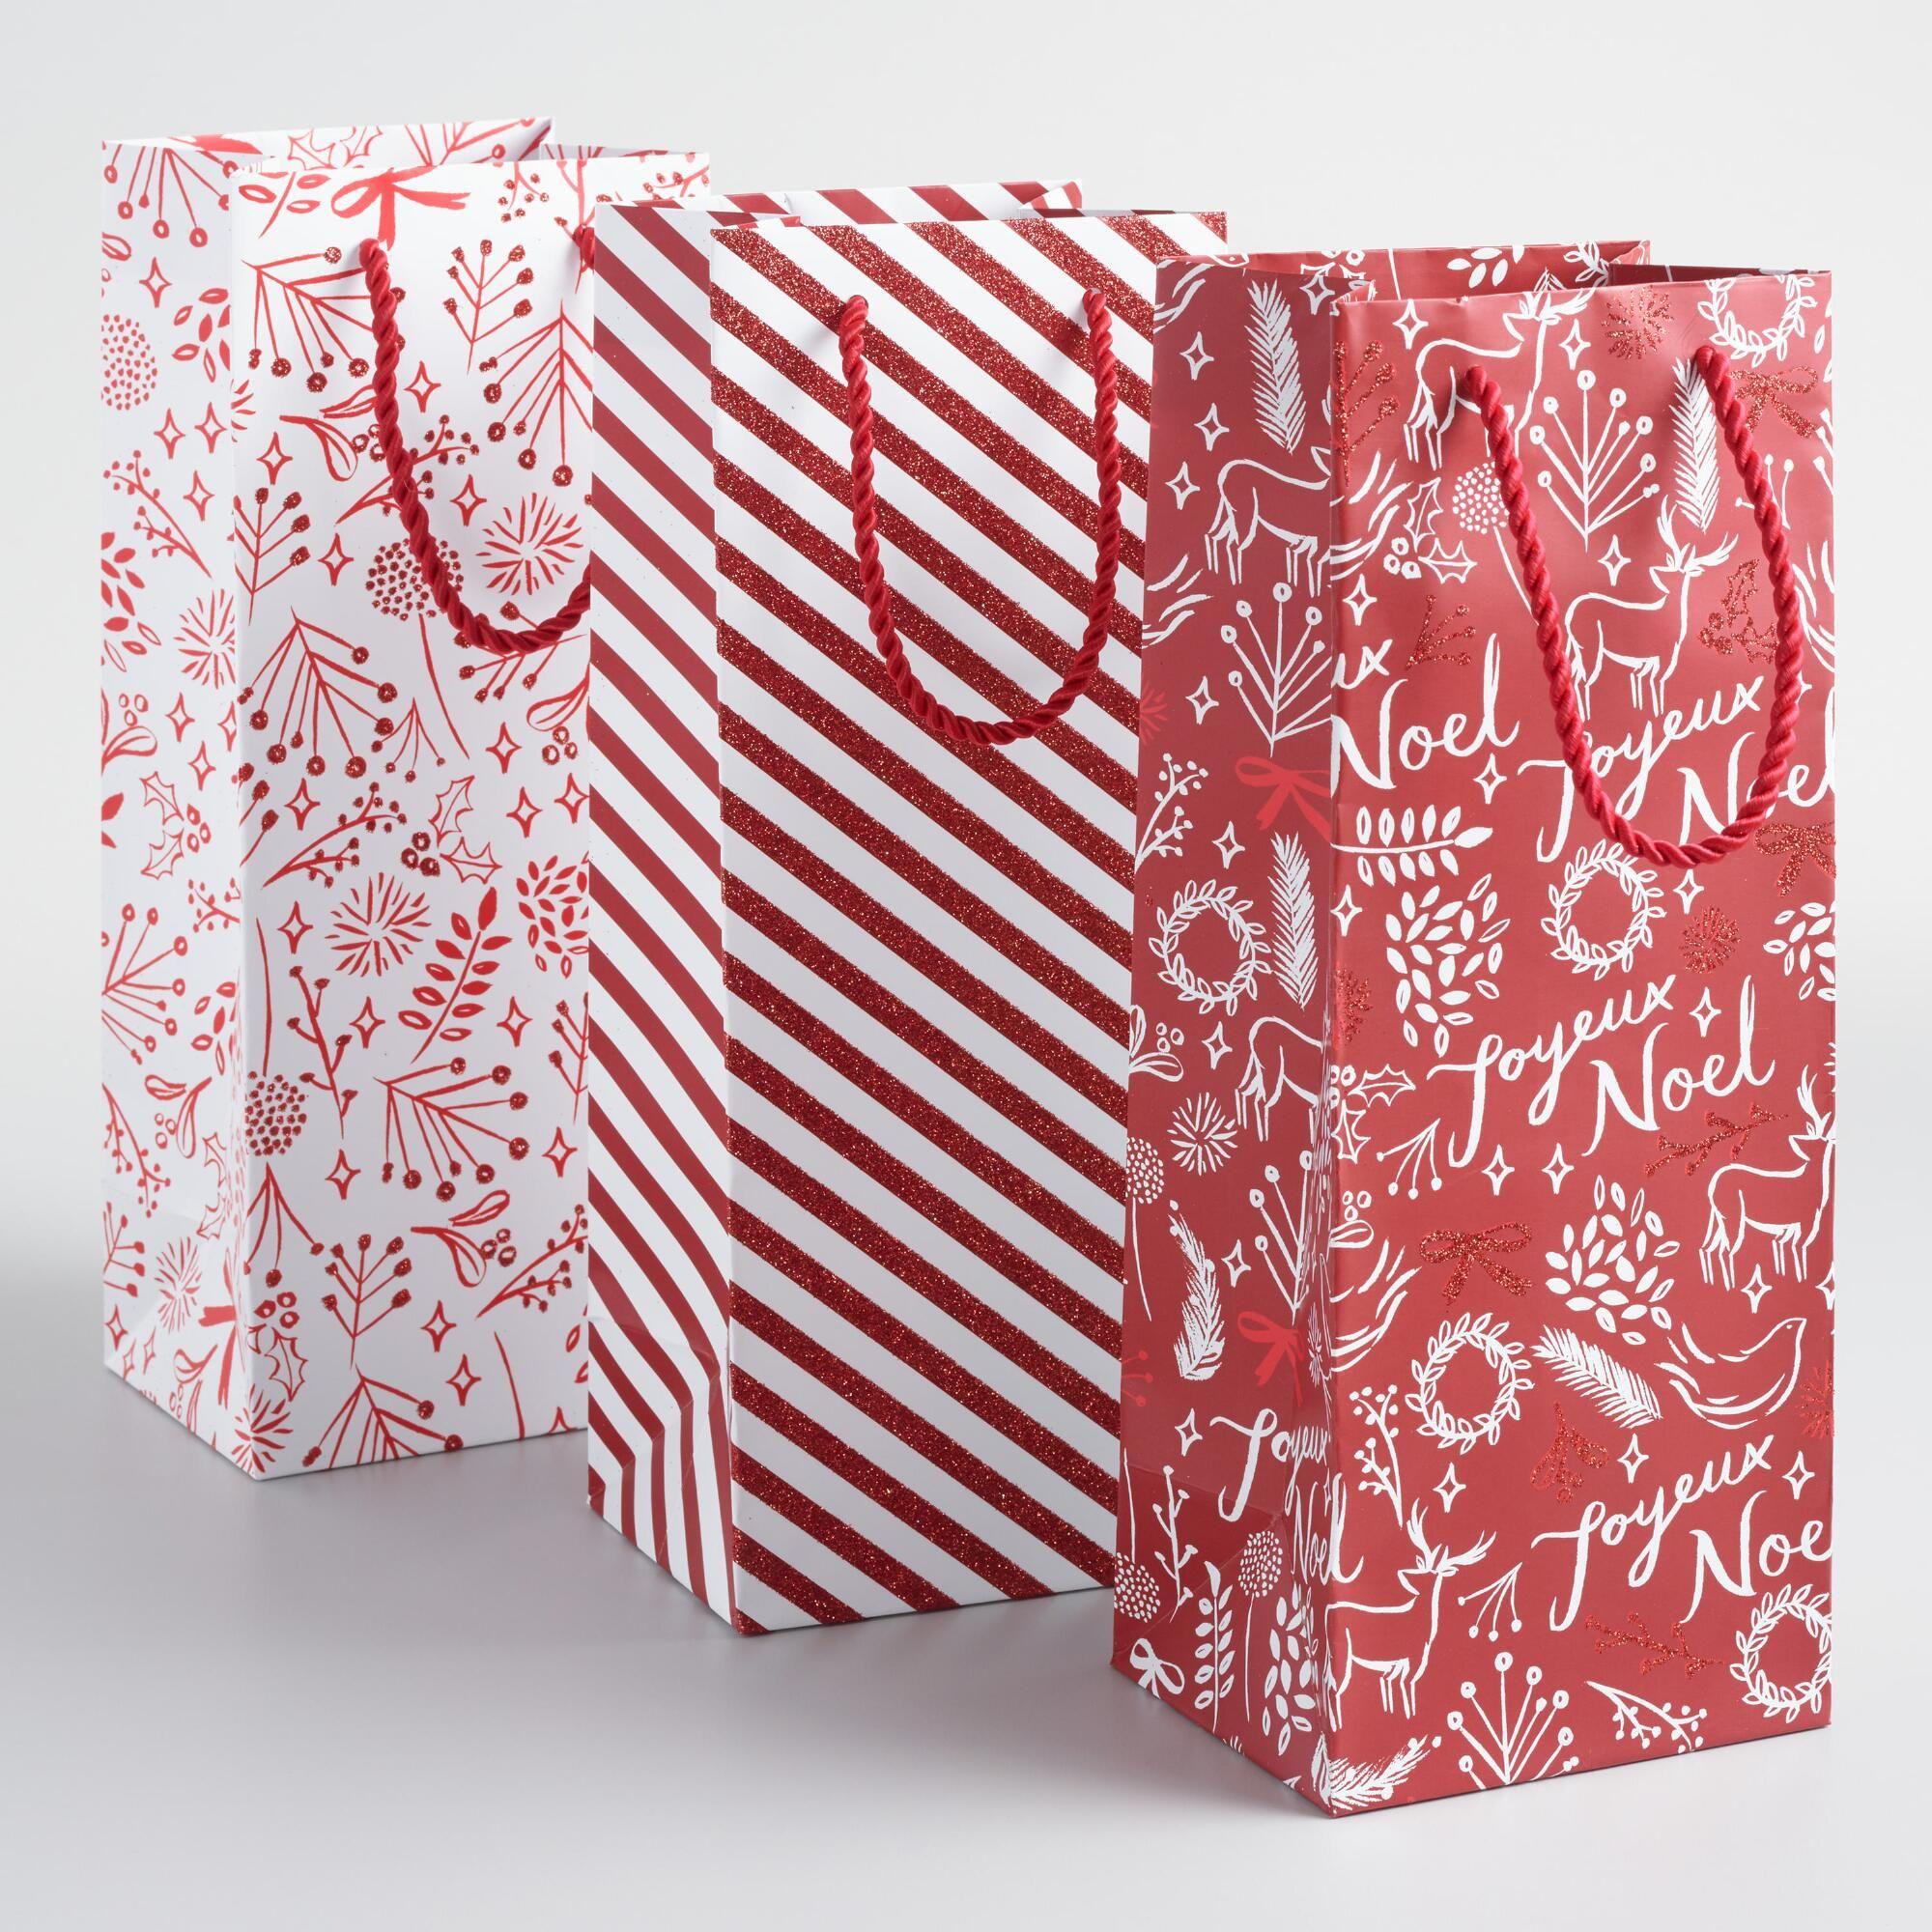 Red And White Wonderland Wine Bags Set Of 3 Holiday Gift Bag Wine Bag Christmas Gift Bags